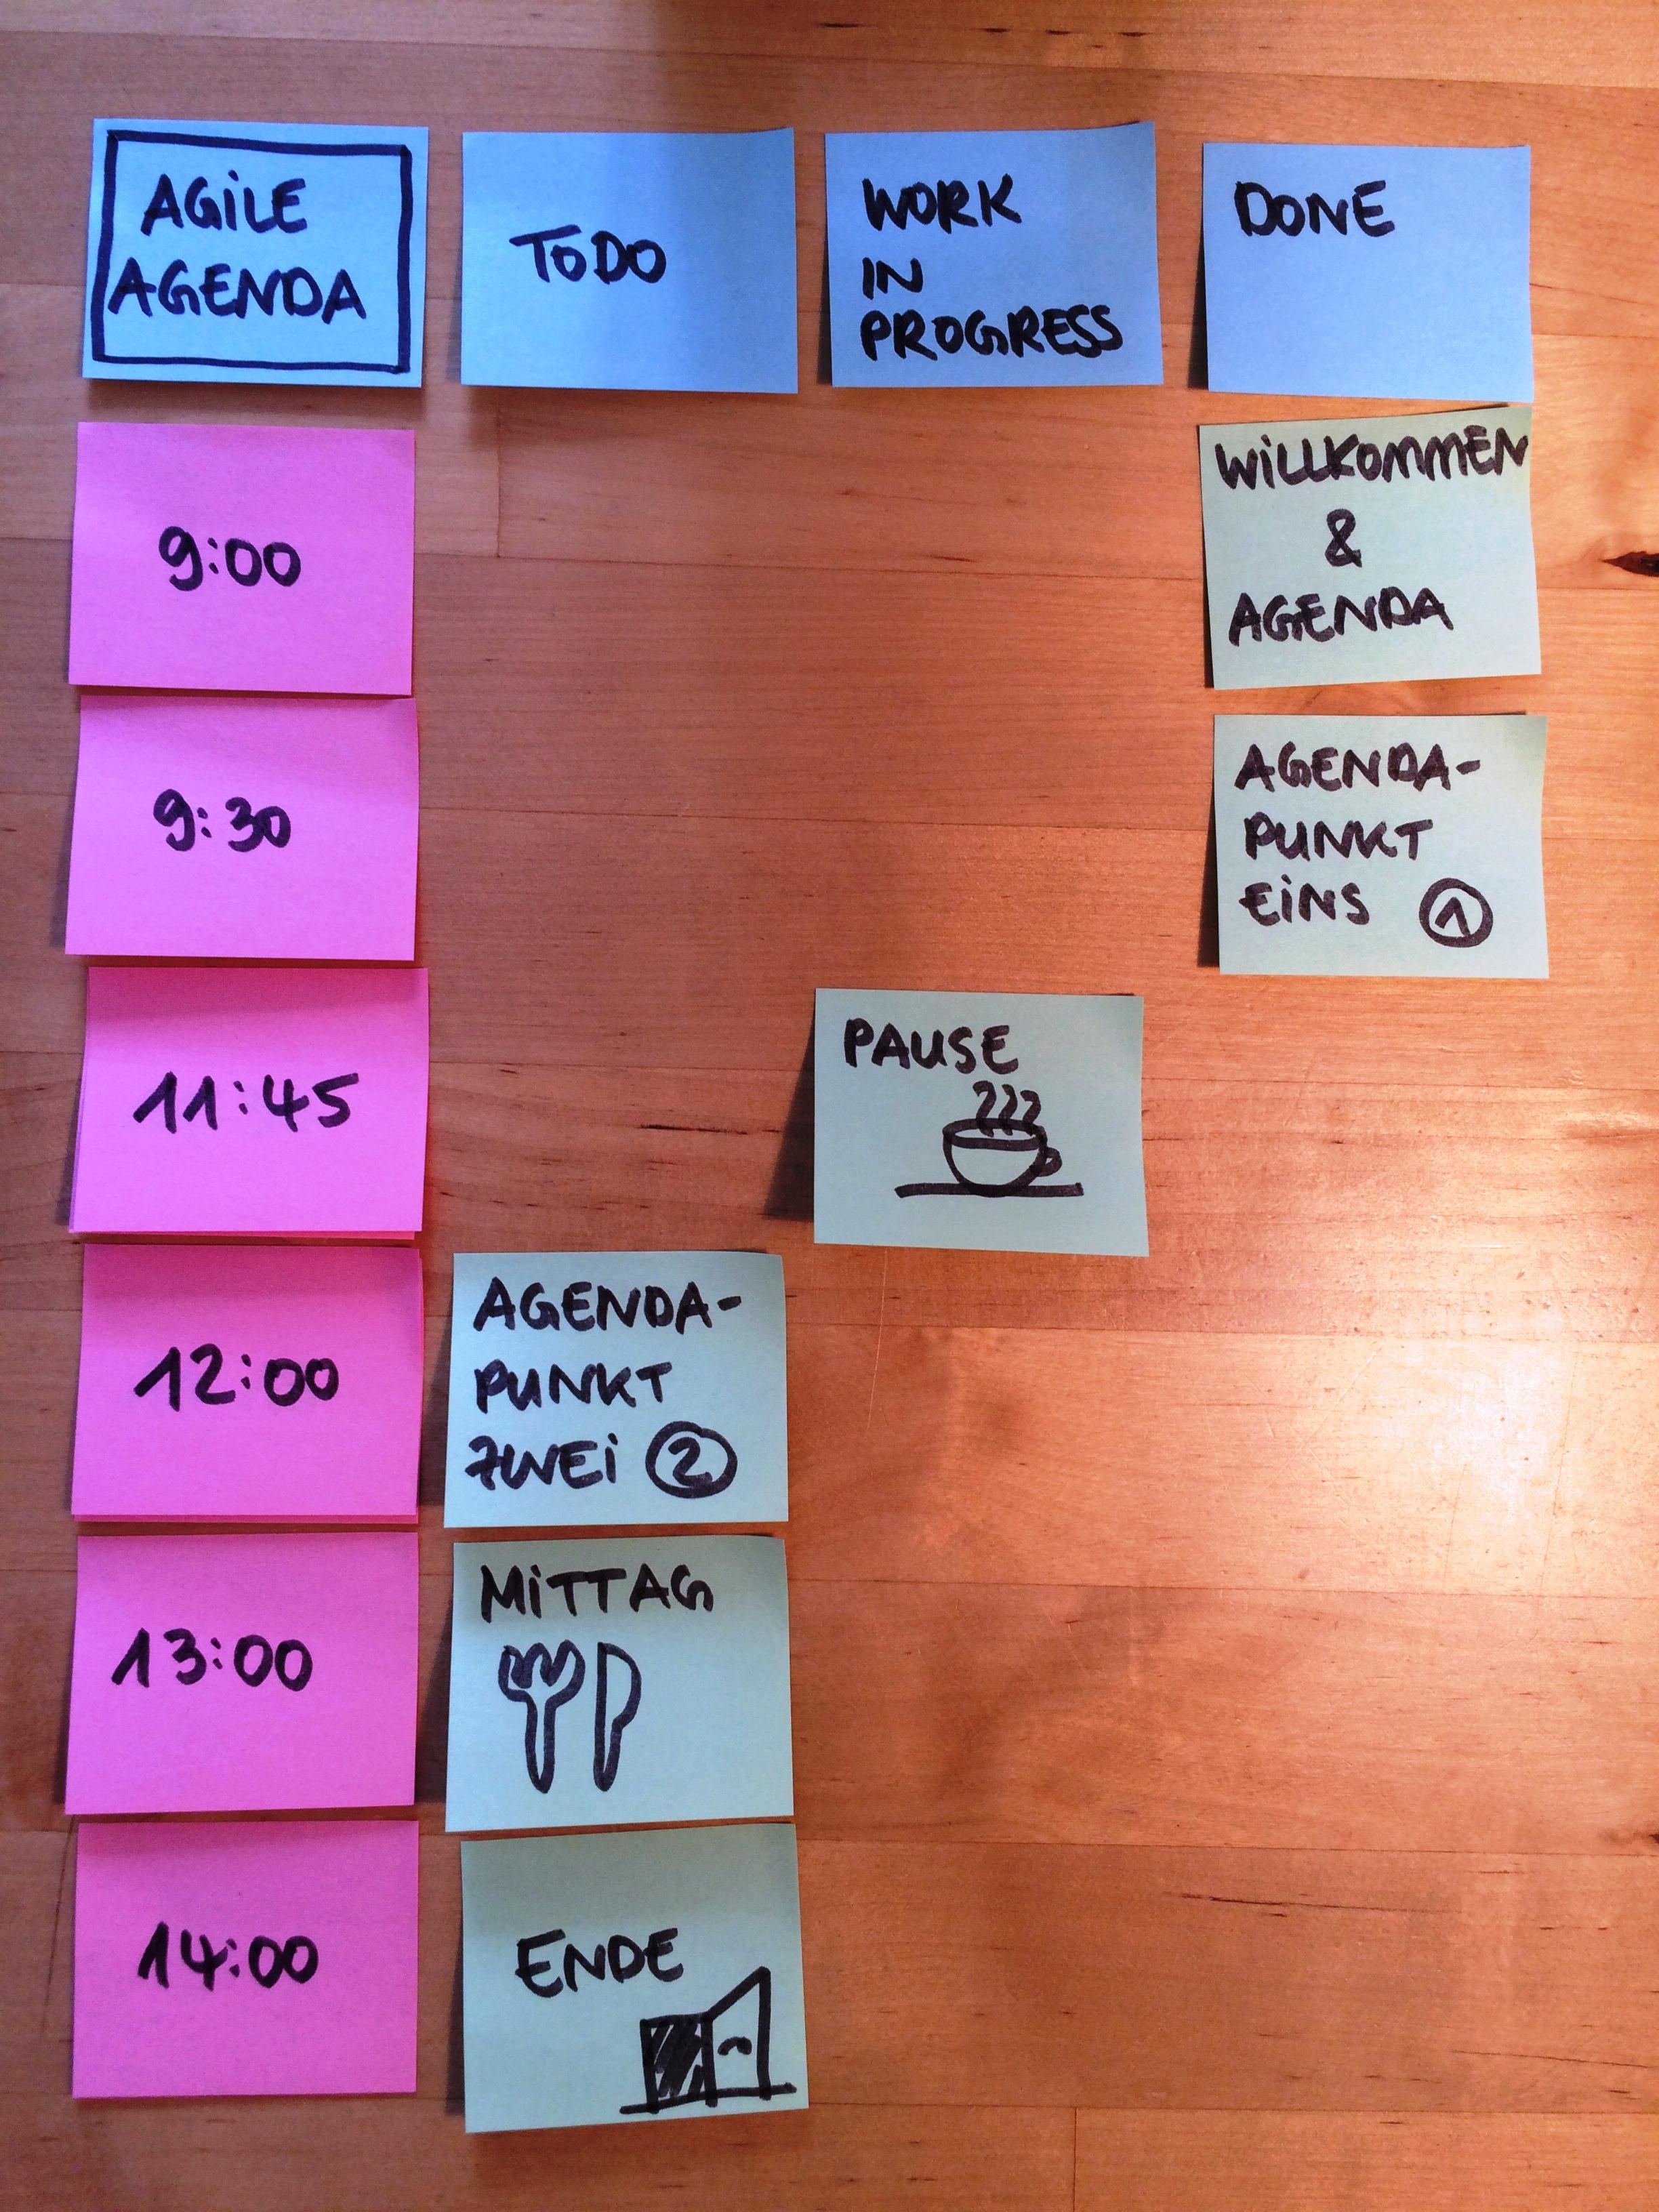 Agile Agenda